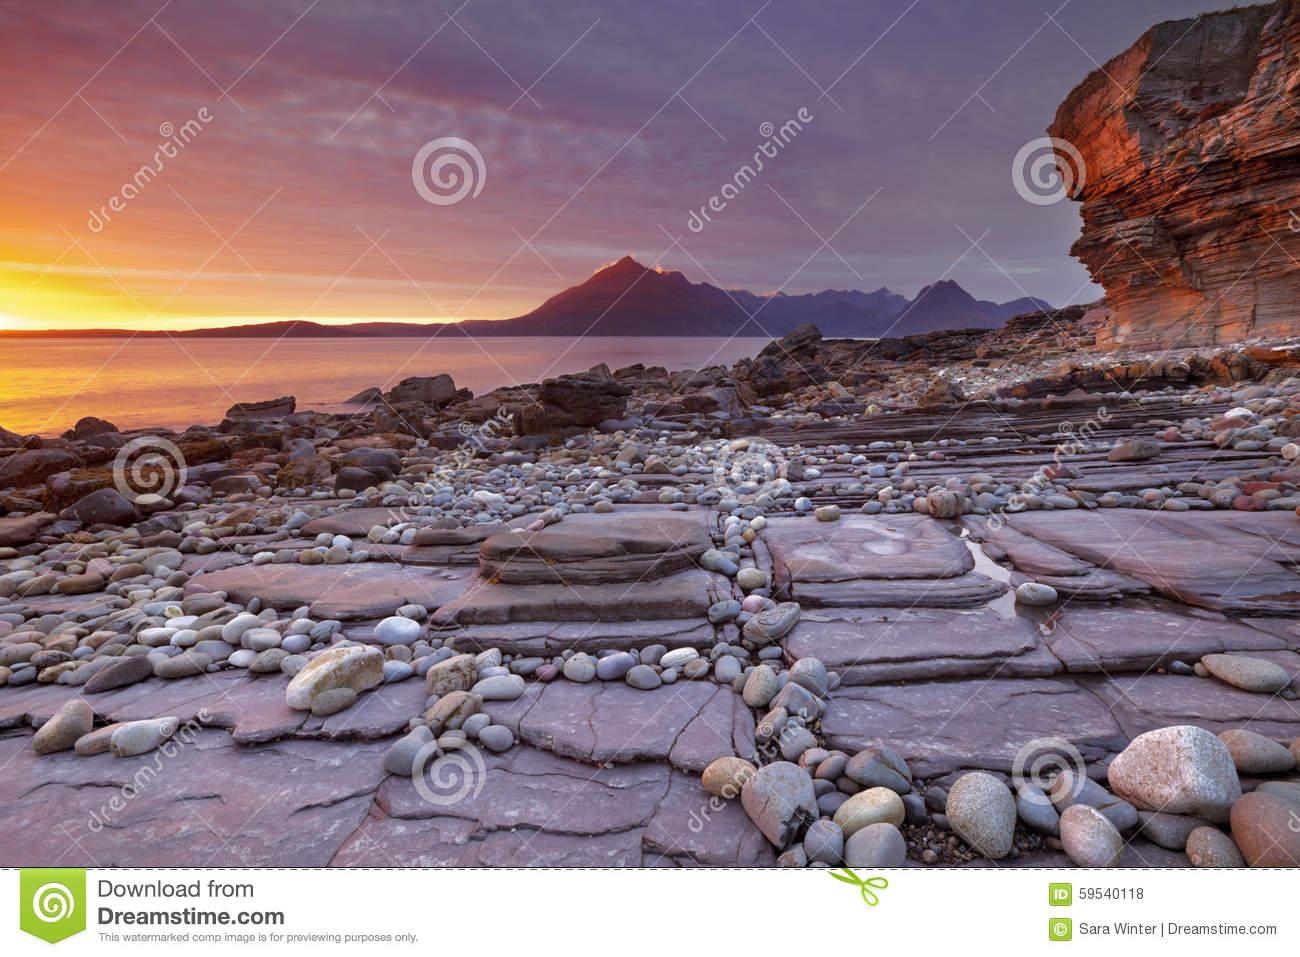 Sunset At The Beach Of Elgol, Isle Of Skye, Scotland Stock Photo.